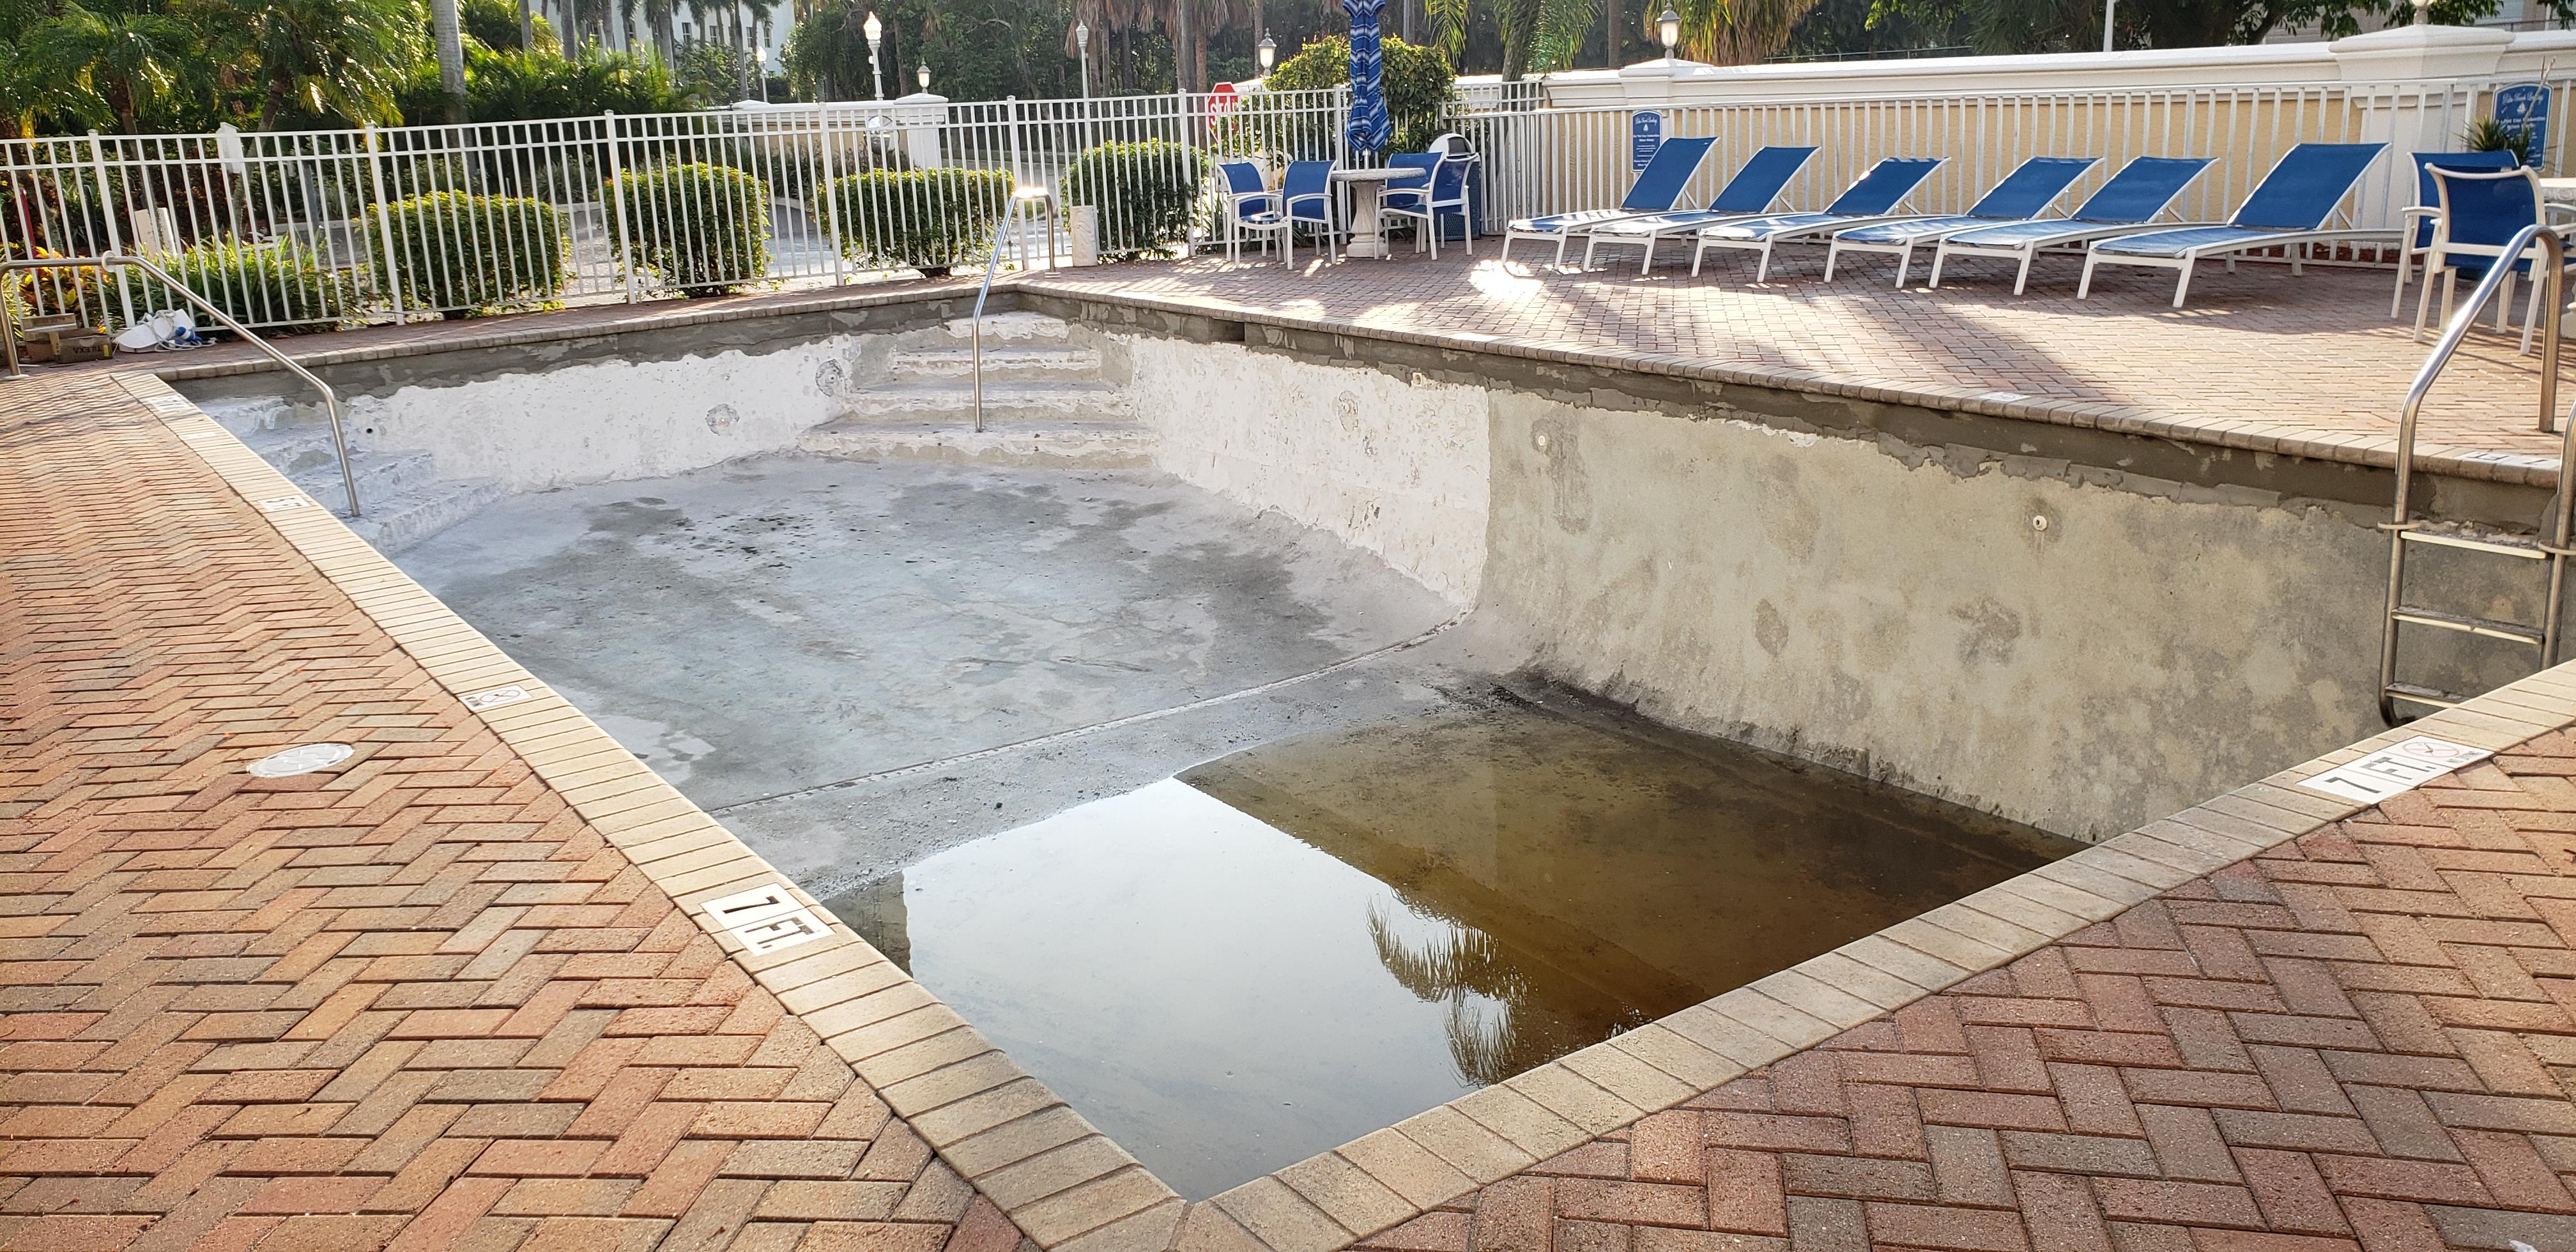 2019-07-11 Pool Resurfacing (3)